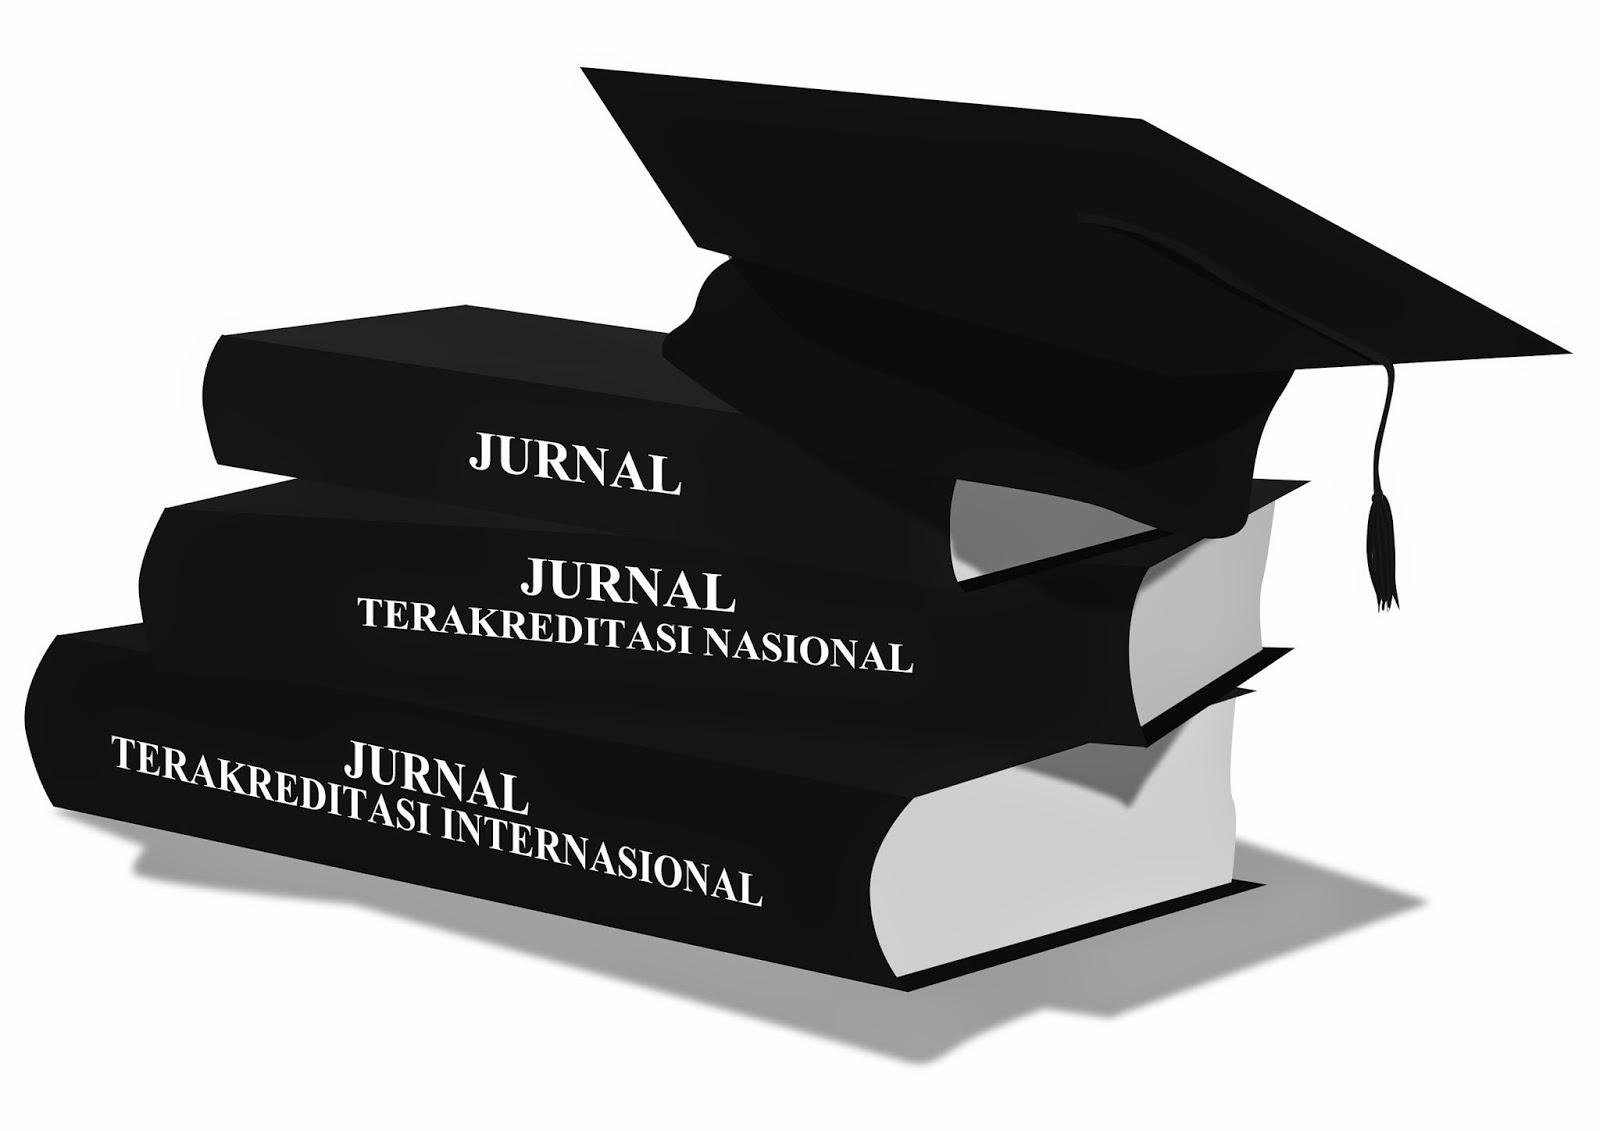 Contoh Jurnal Ilmiah Linguistik Ronaldus Rilman